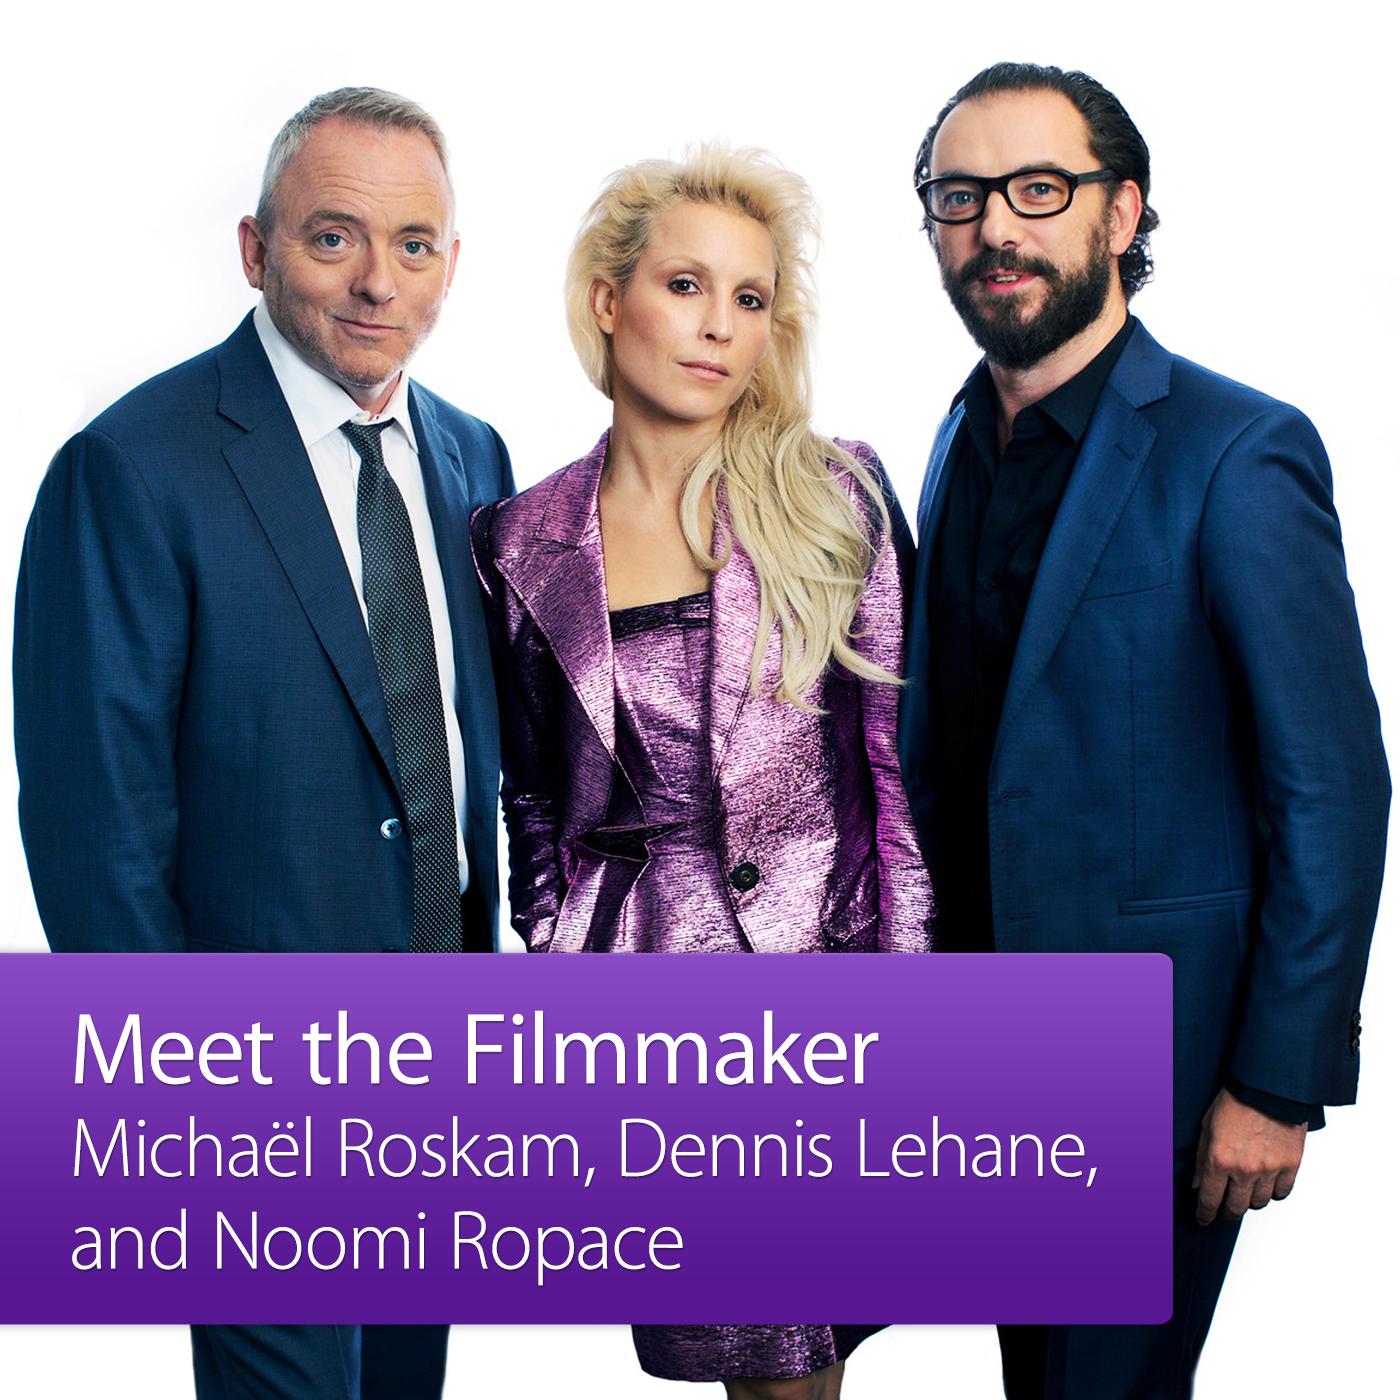 Michaël Roskam, Dennis Lehane, and Noomi Rapace: Meet the Filmmaker